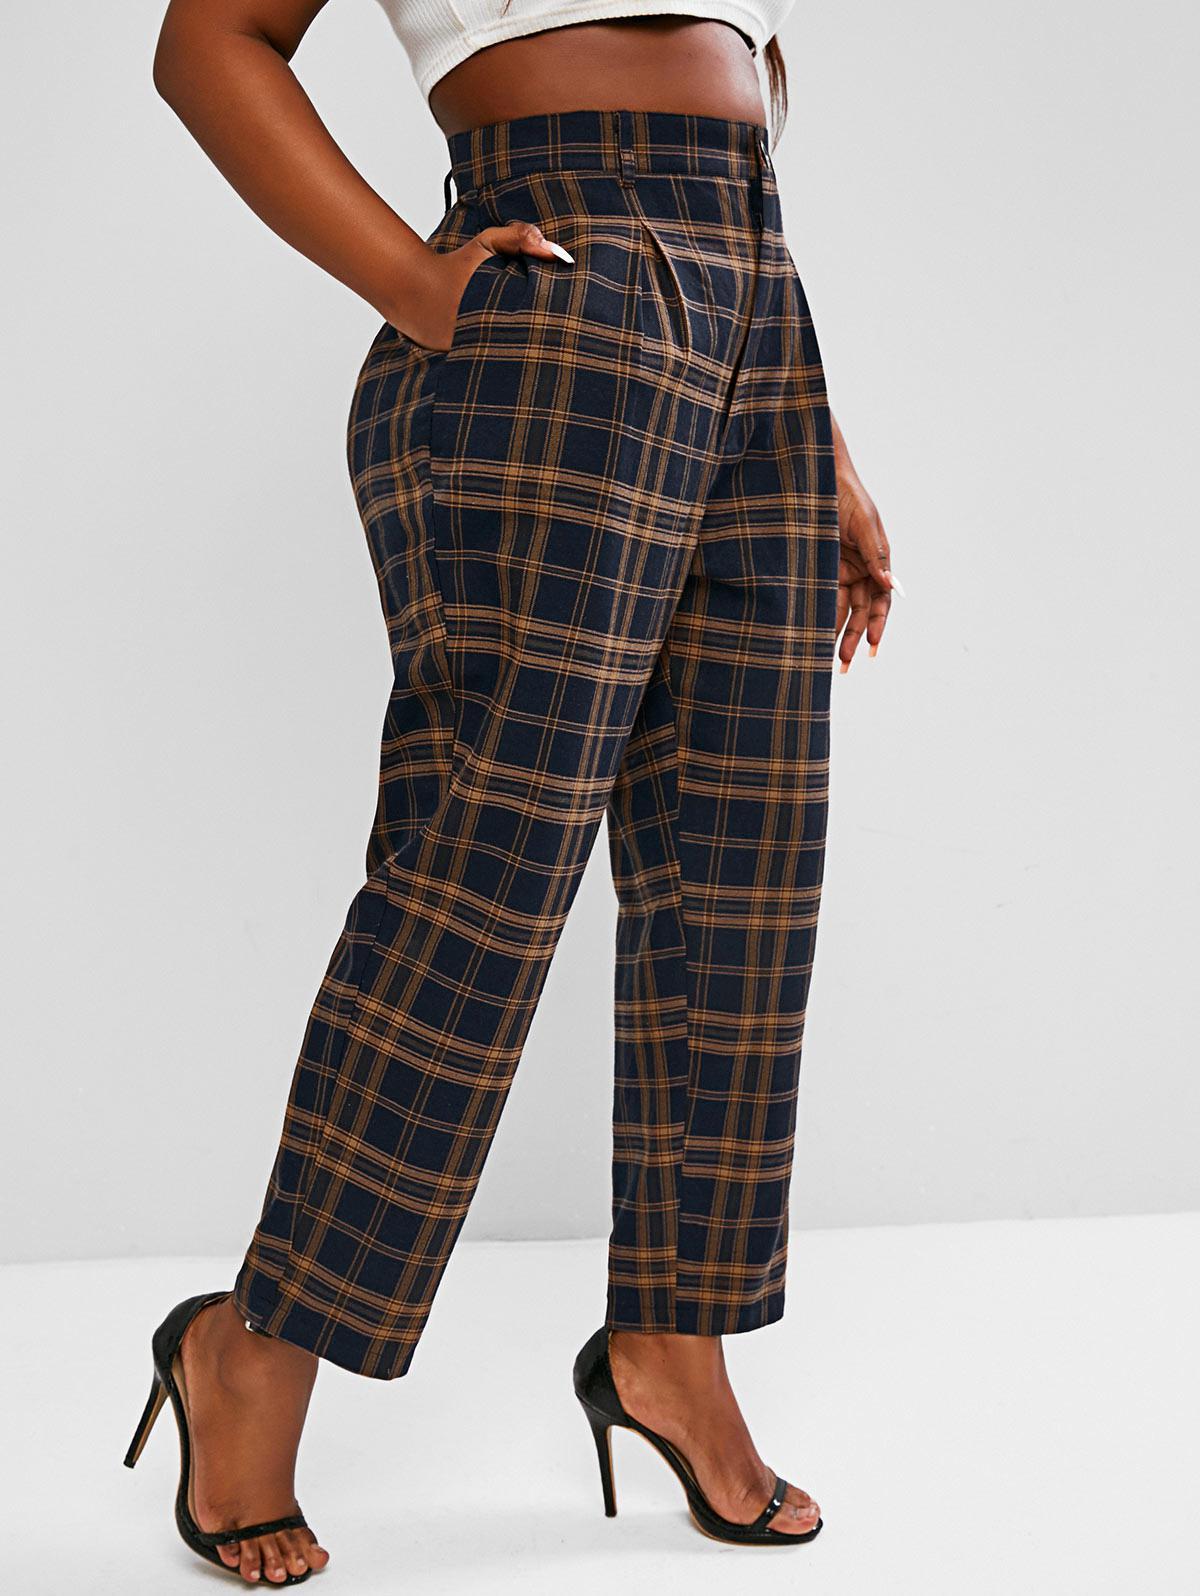 ZAFUL Plus Size High Waisted Plaid Print Tapered Pants